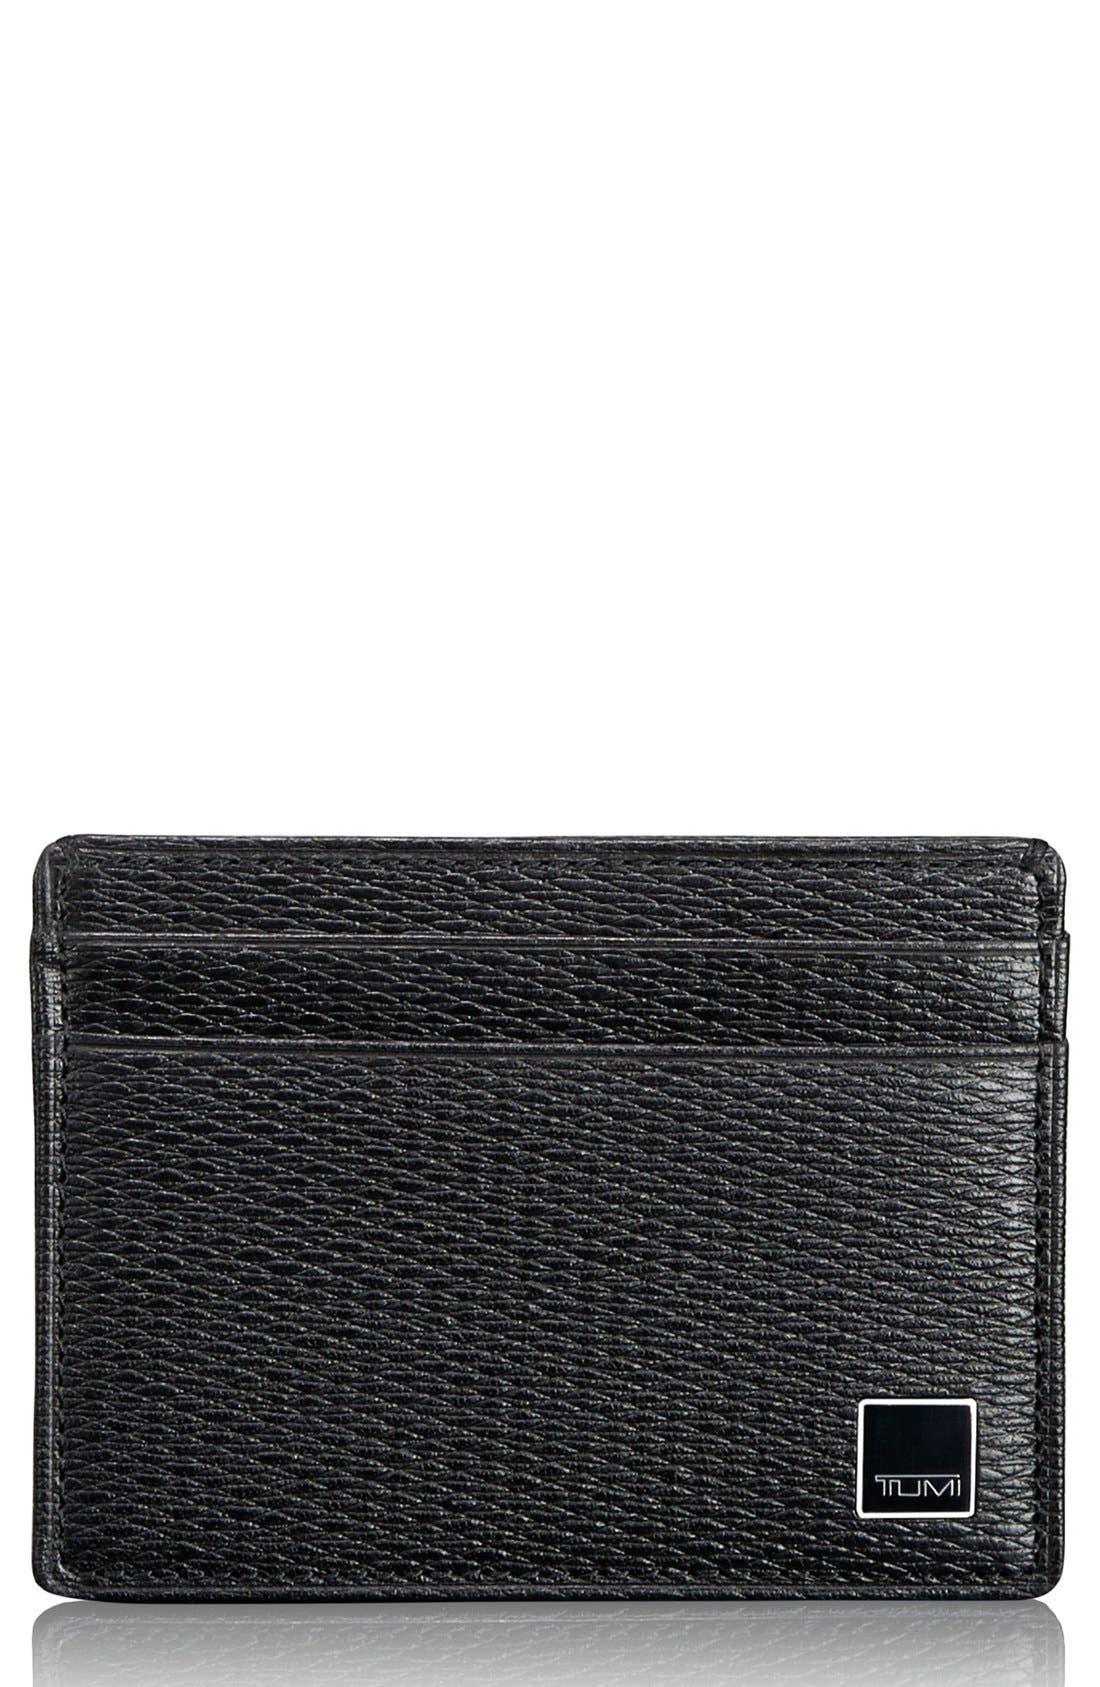 Main Image - Tumi 'Monaco' Slim Card Case